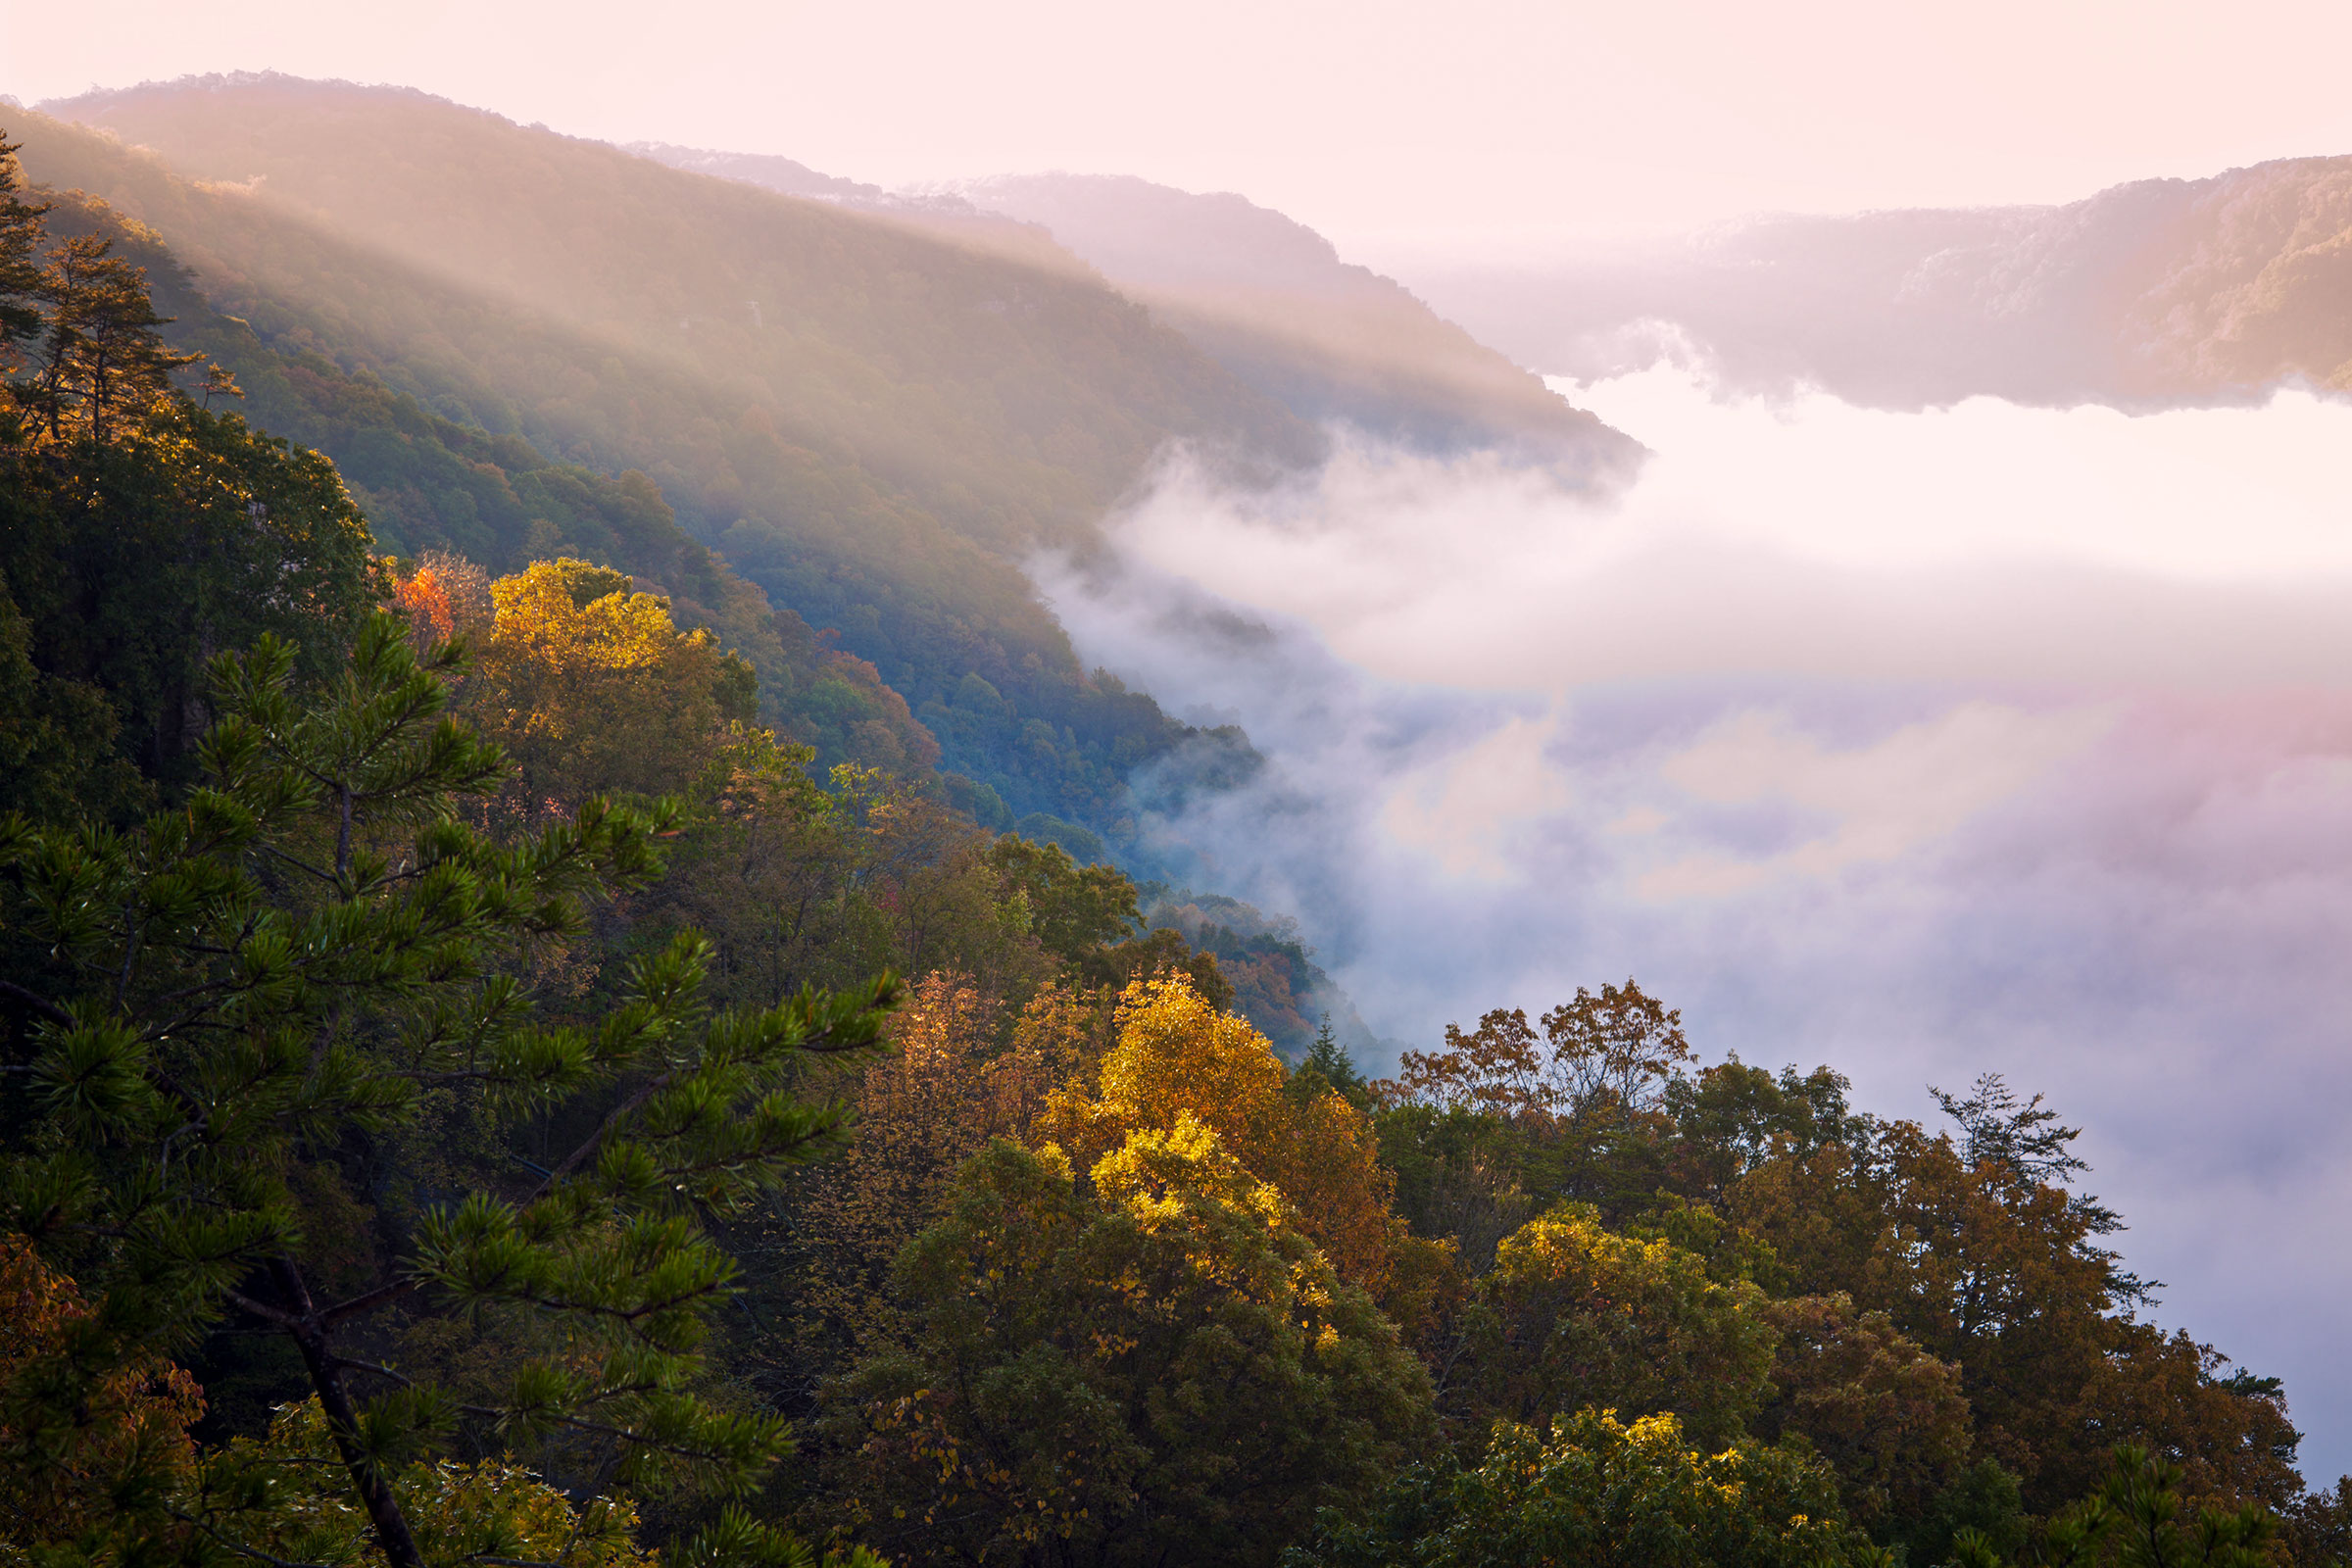 Fog rolls through New River Gorge National Park at sunrise. Henryk Sadura/Alamy